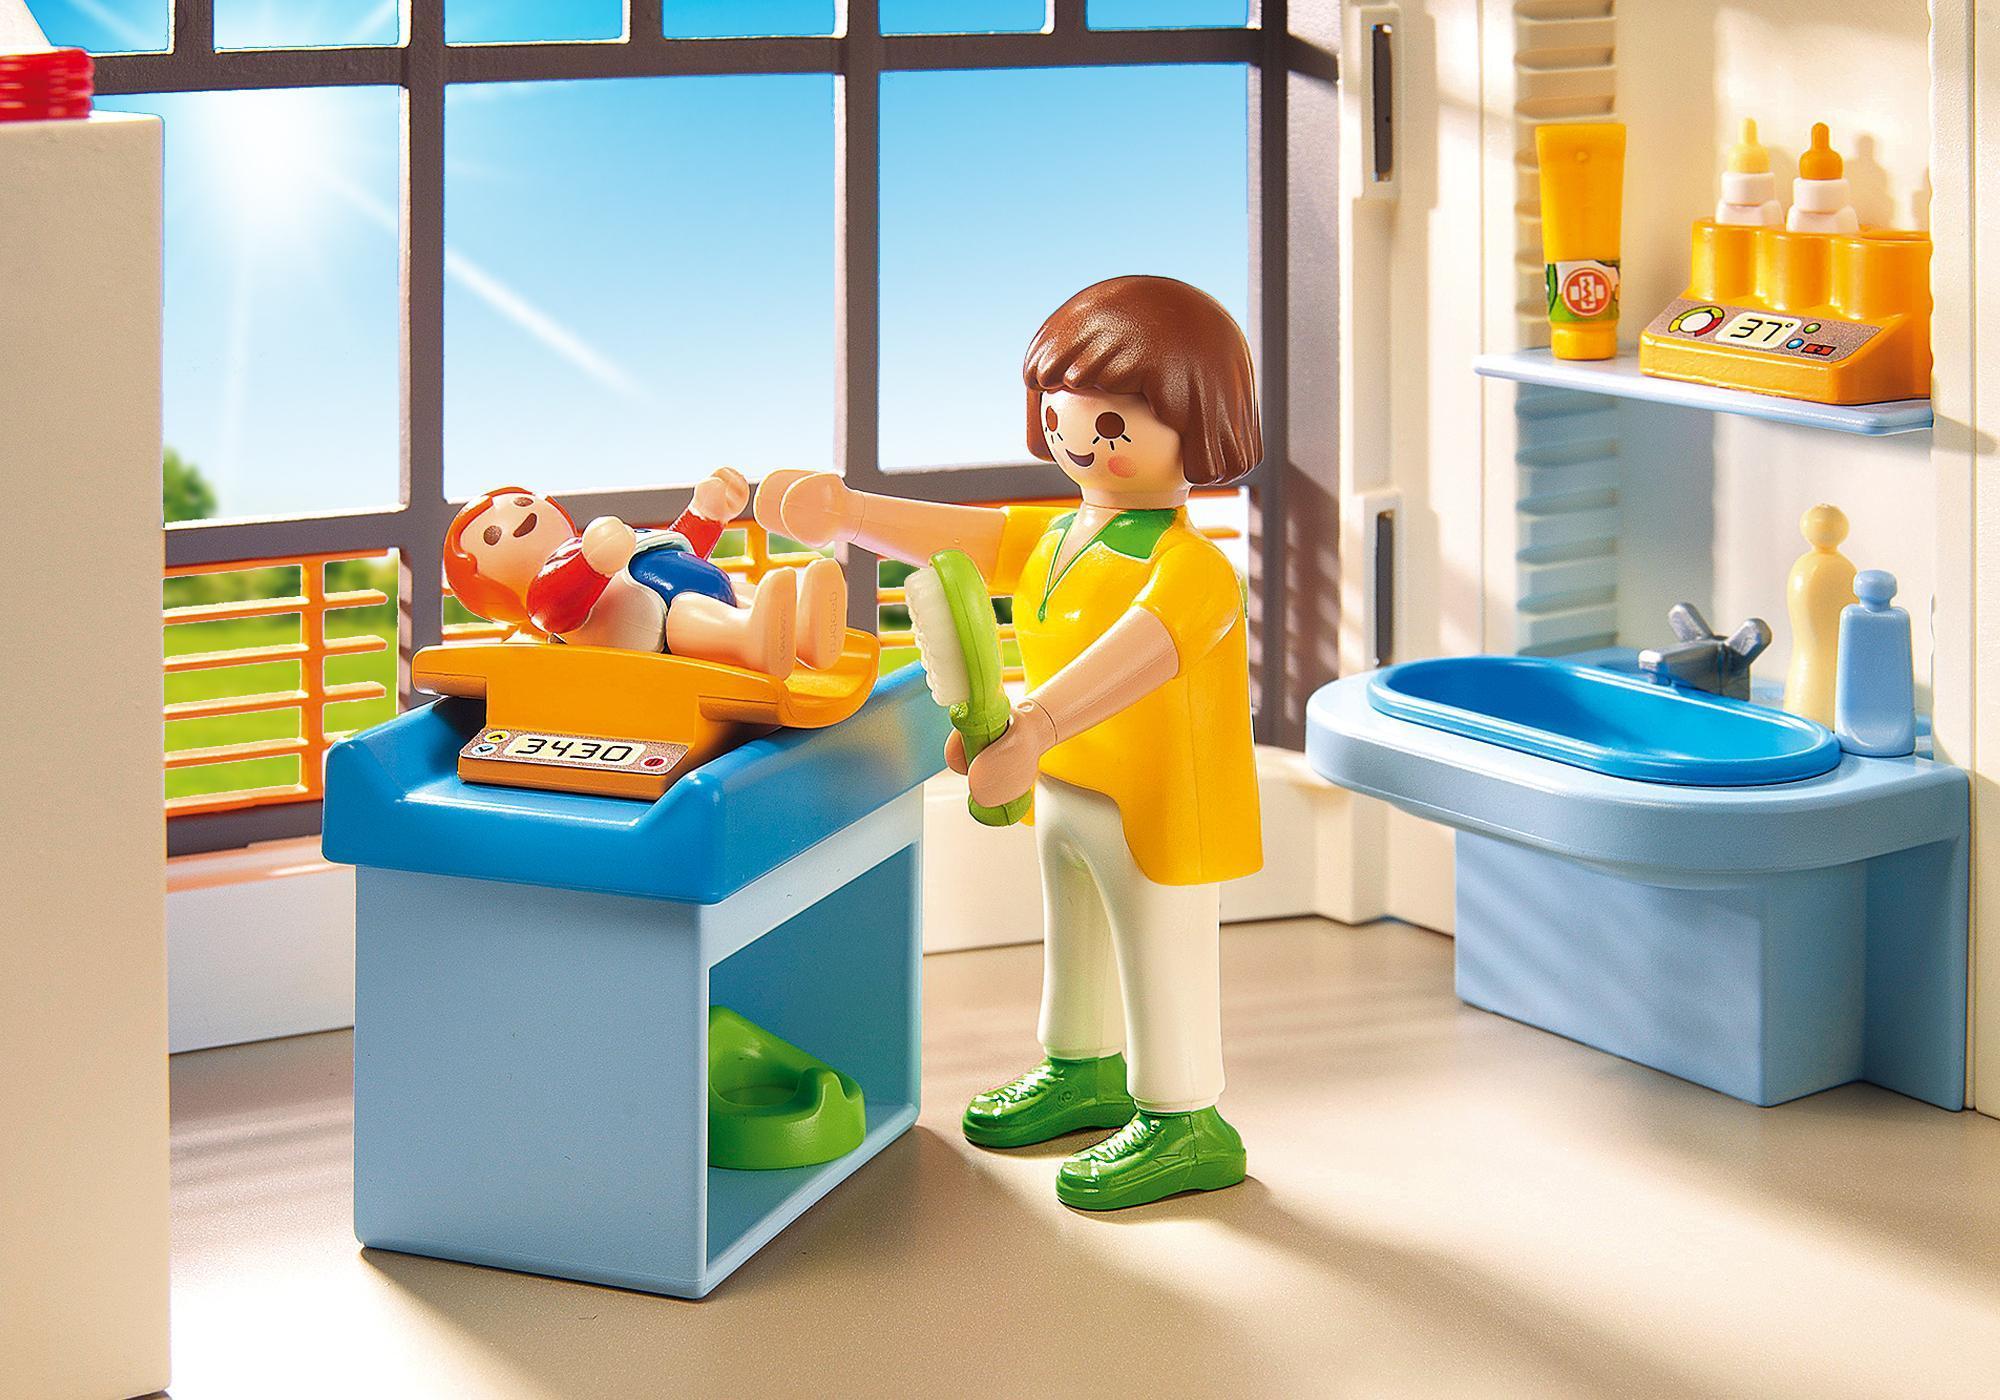 http://media.playmobil.com/i/playmobil/6657_product_extra3/Furnished Children's Hospital